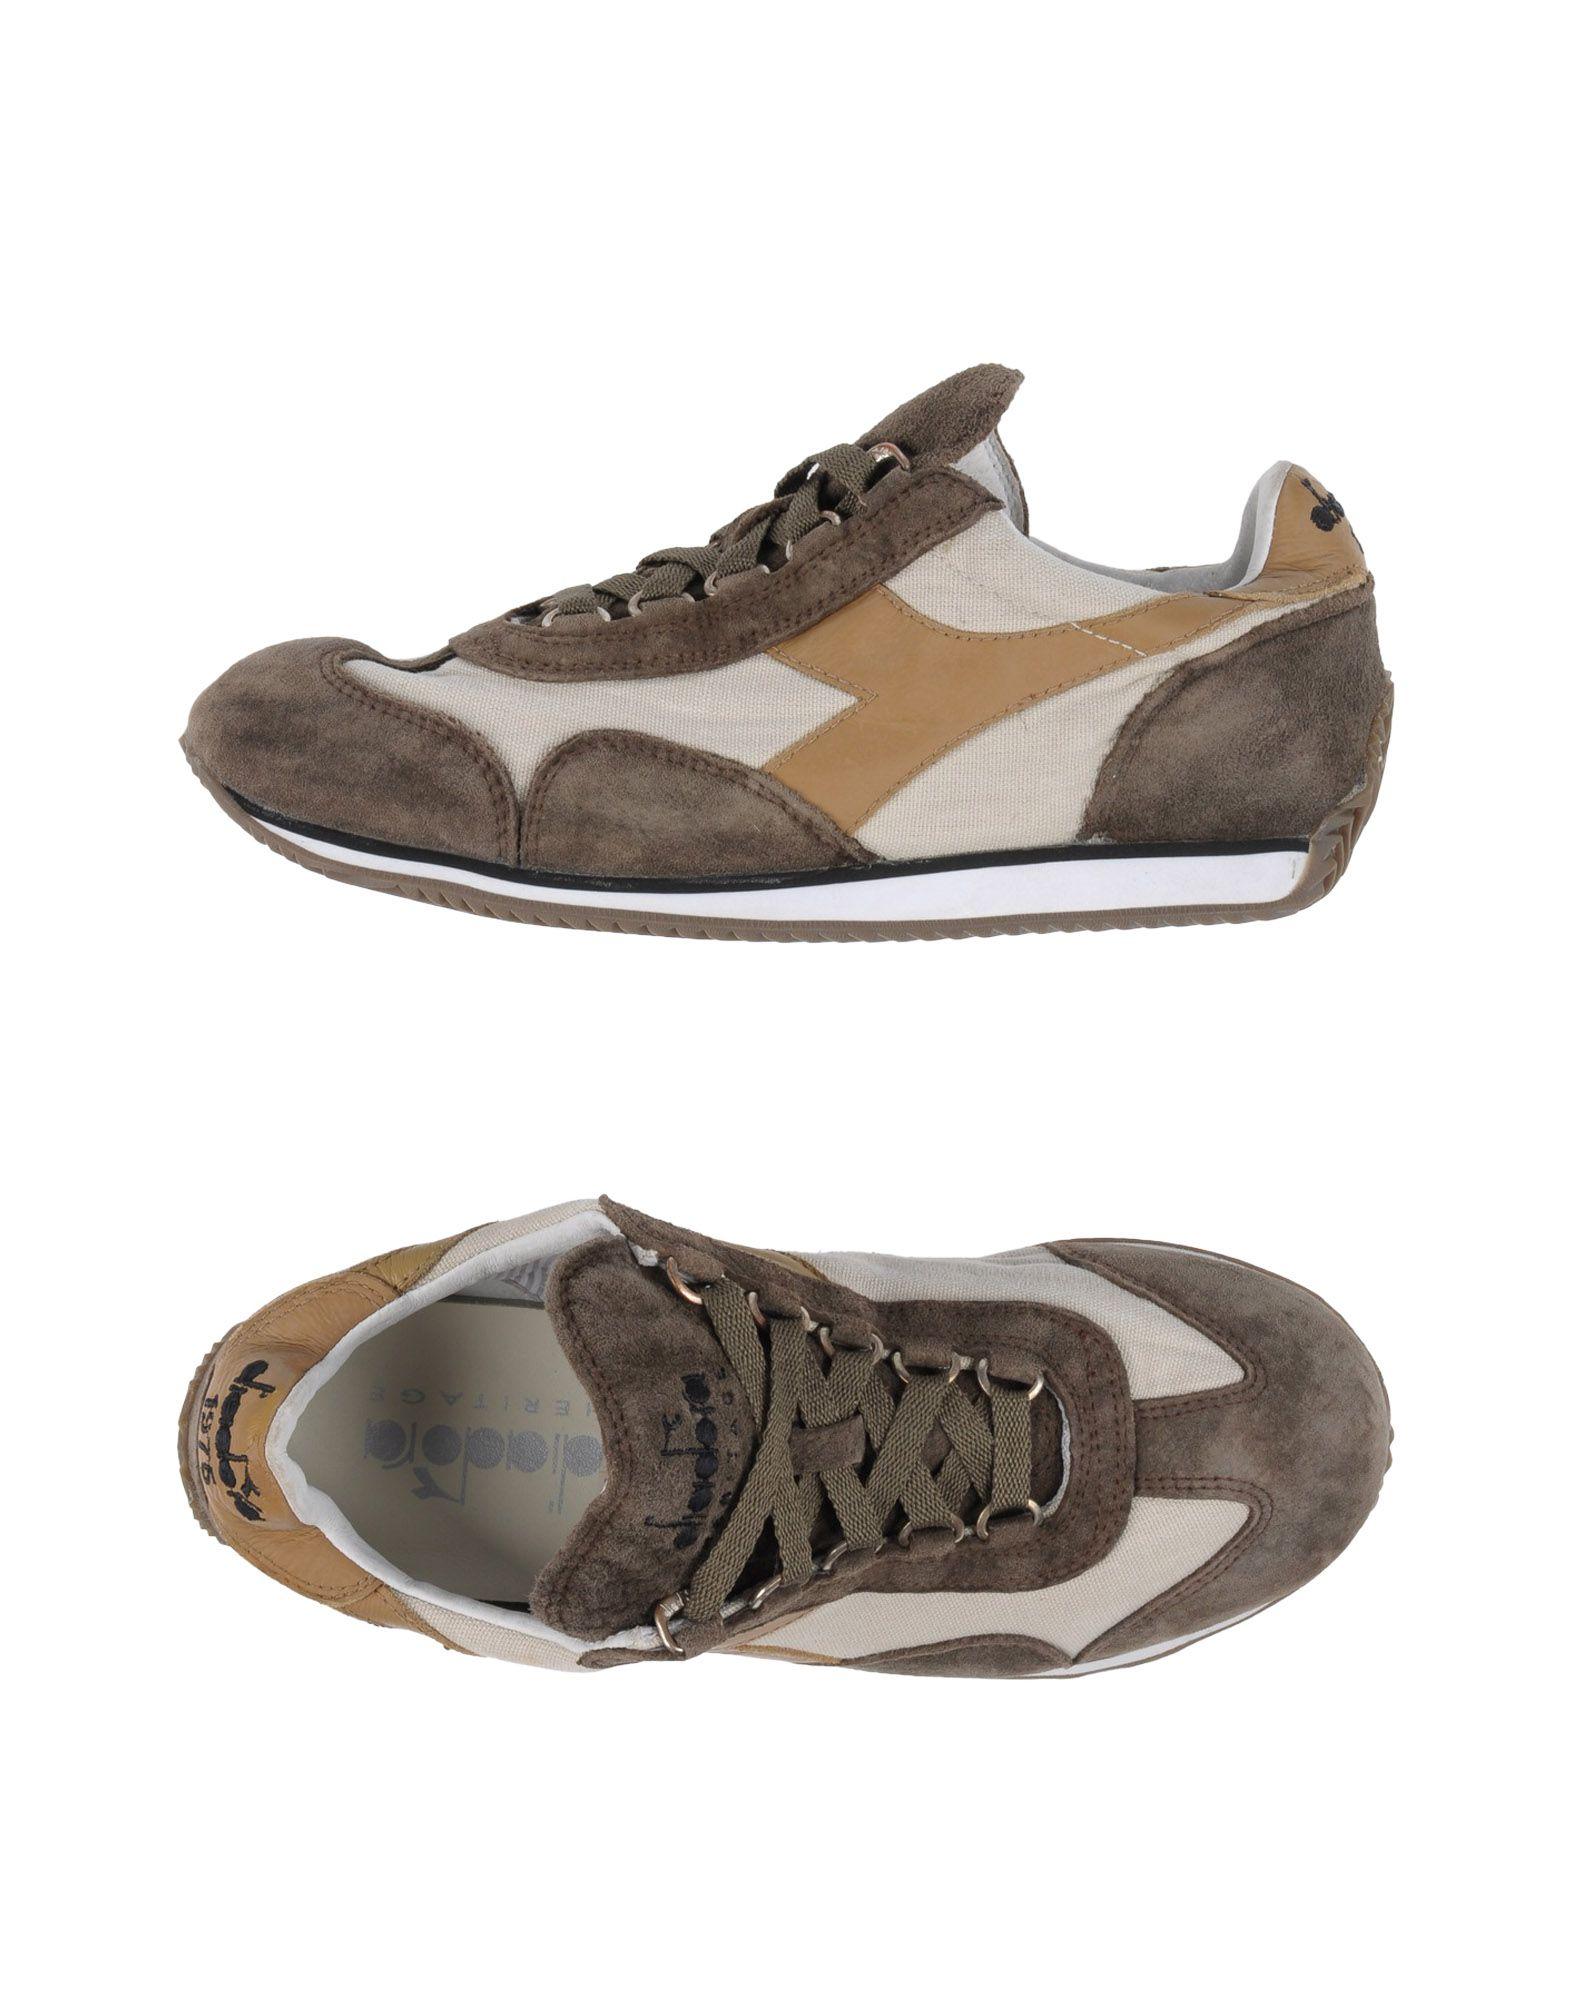 Diadora Heritage Sneakers - Women Diadora Heritage Sneakers online 11138384DJ on  Australia - 11138384DJ online 953e39